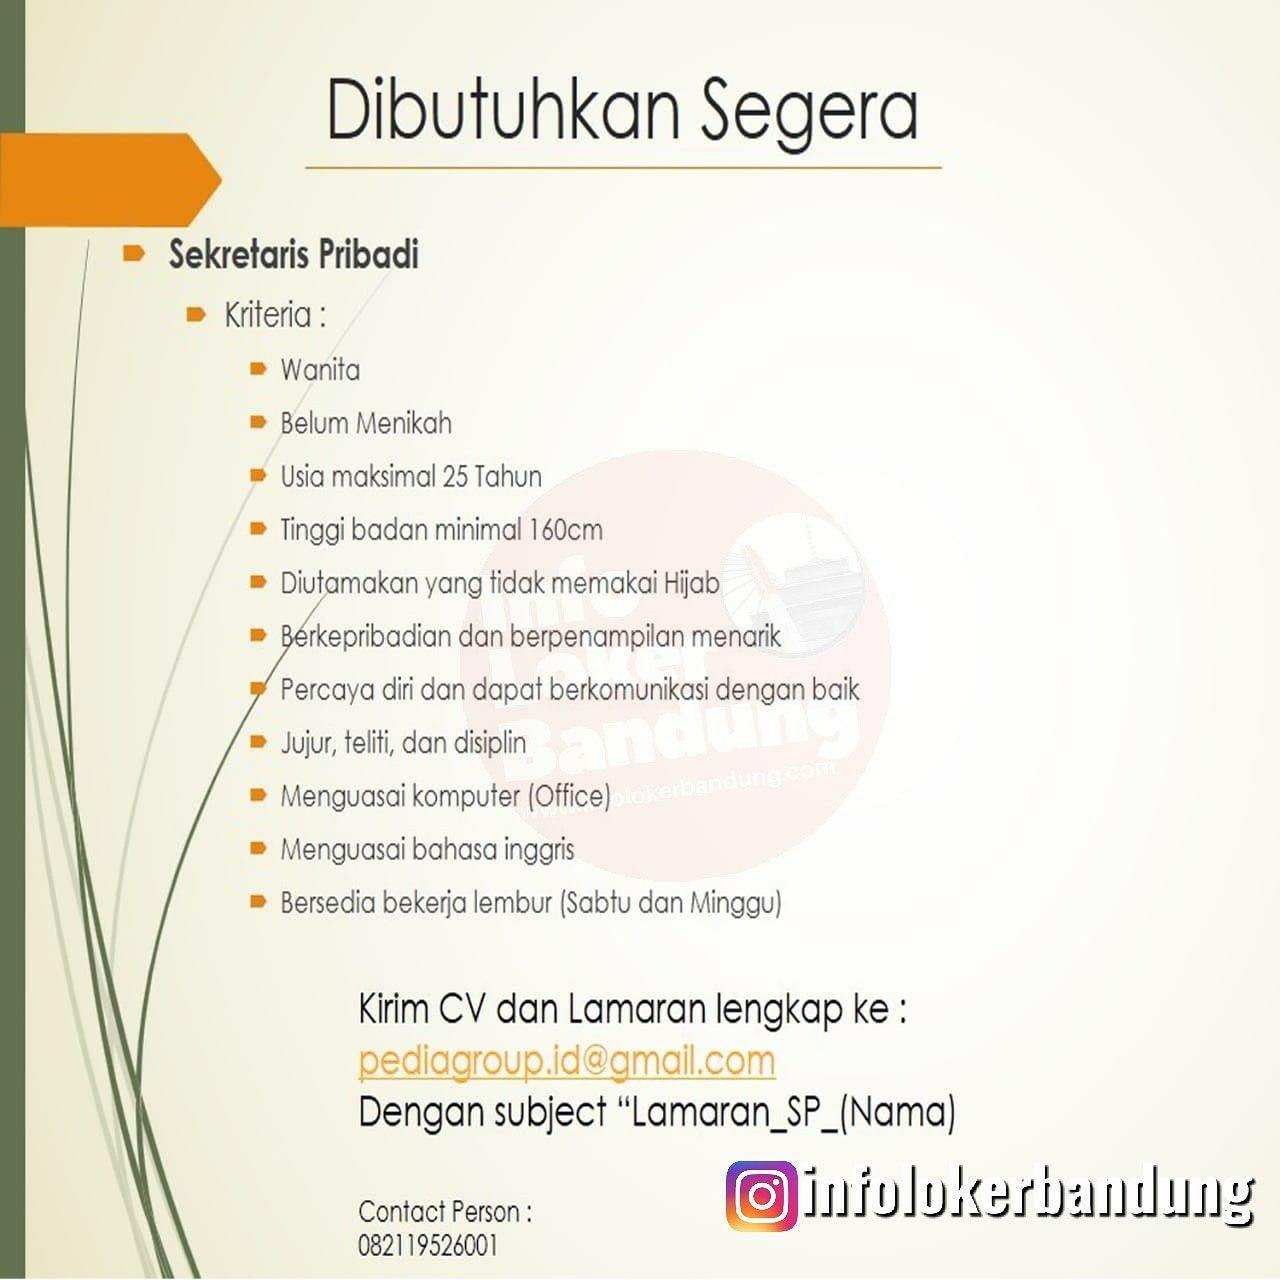 Lowongan Kerja Sekretaris Pribadi Perusahaan Star Up dibidang Property Bandung September 2019